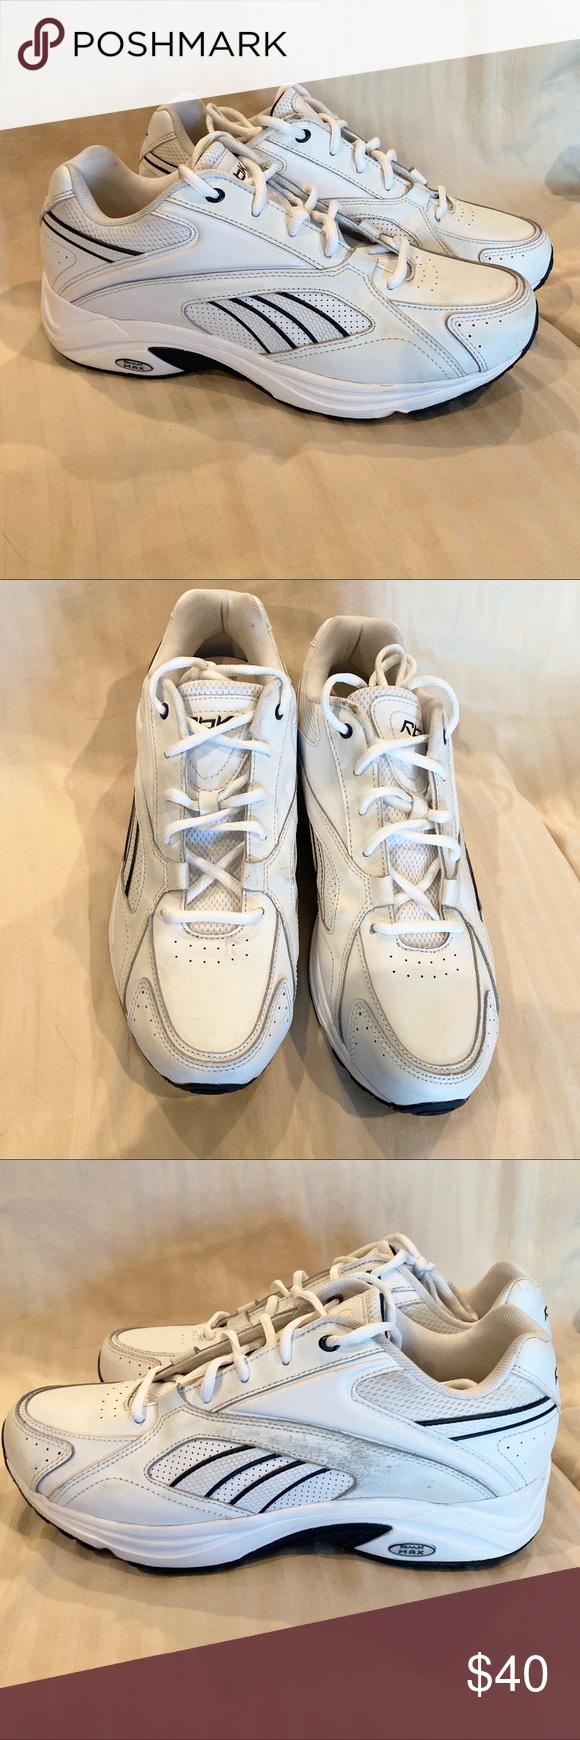 Reebok DMX 6 Walking shoes